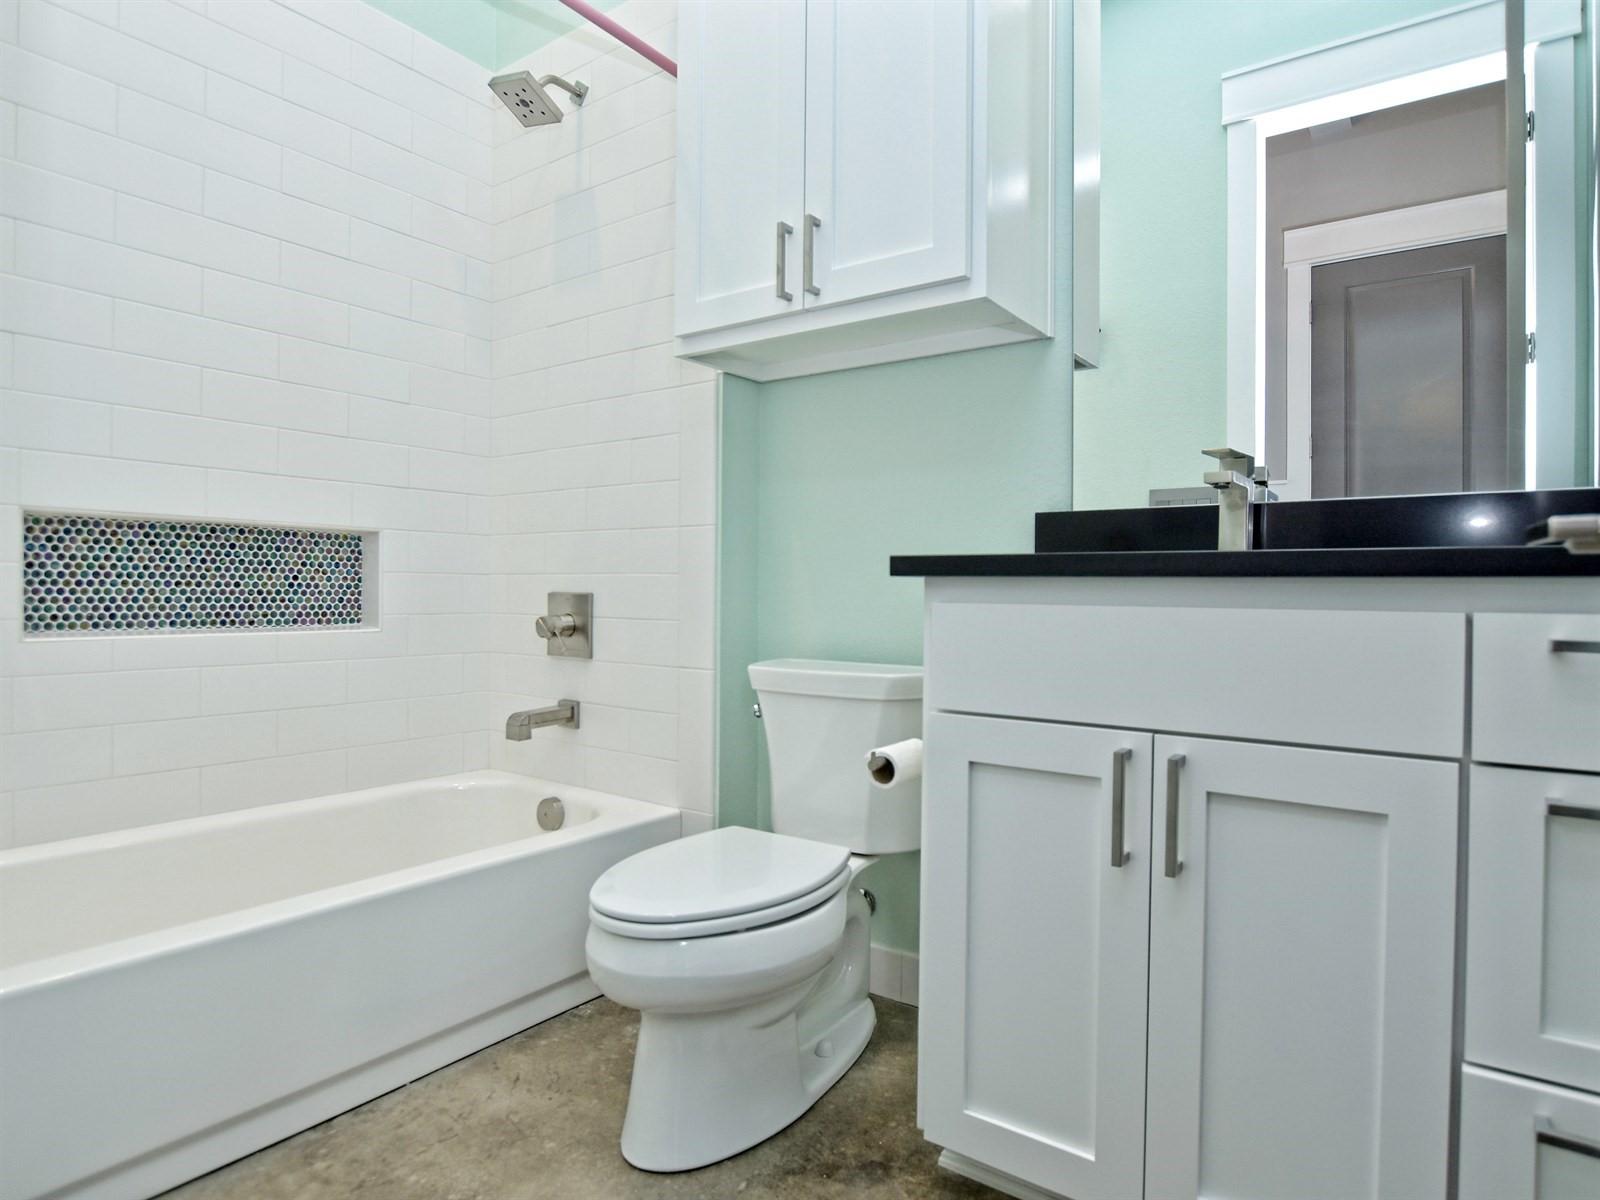 025_2nd Bathroom.jpg